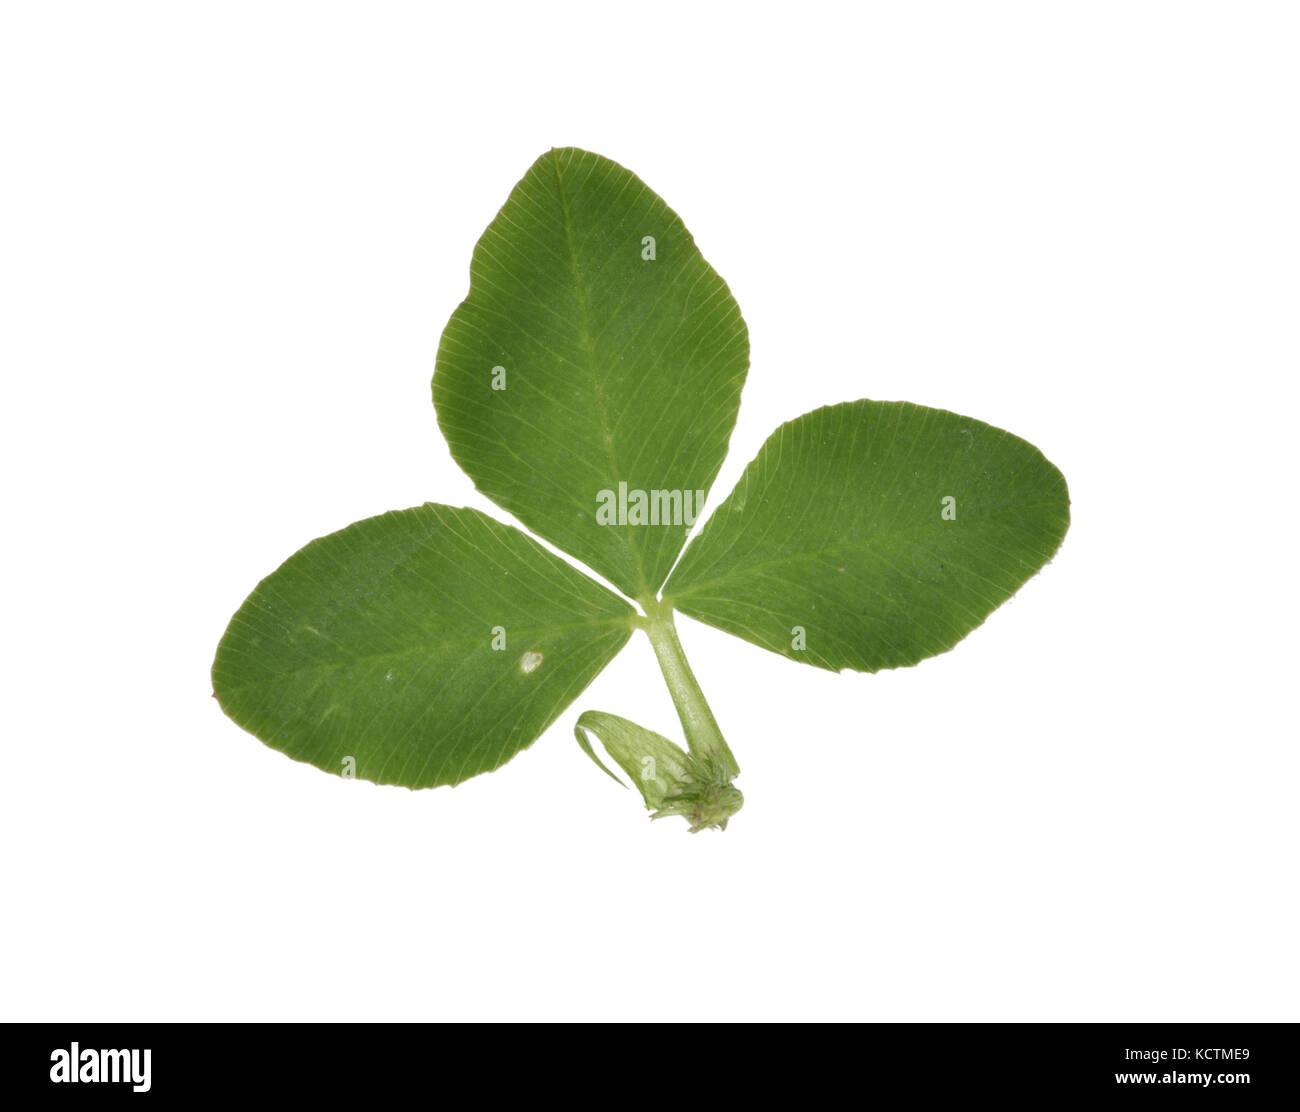 Alsike Clover - Trifolium hybridum Stock Photo